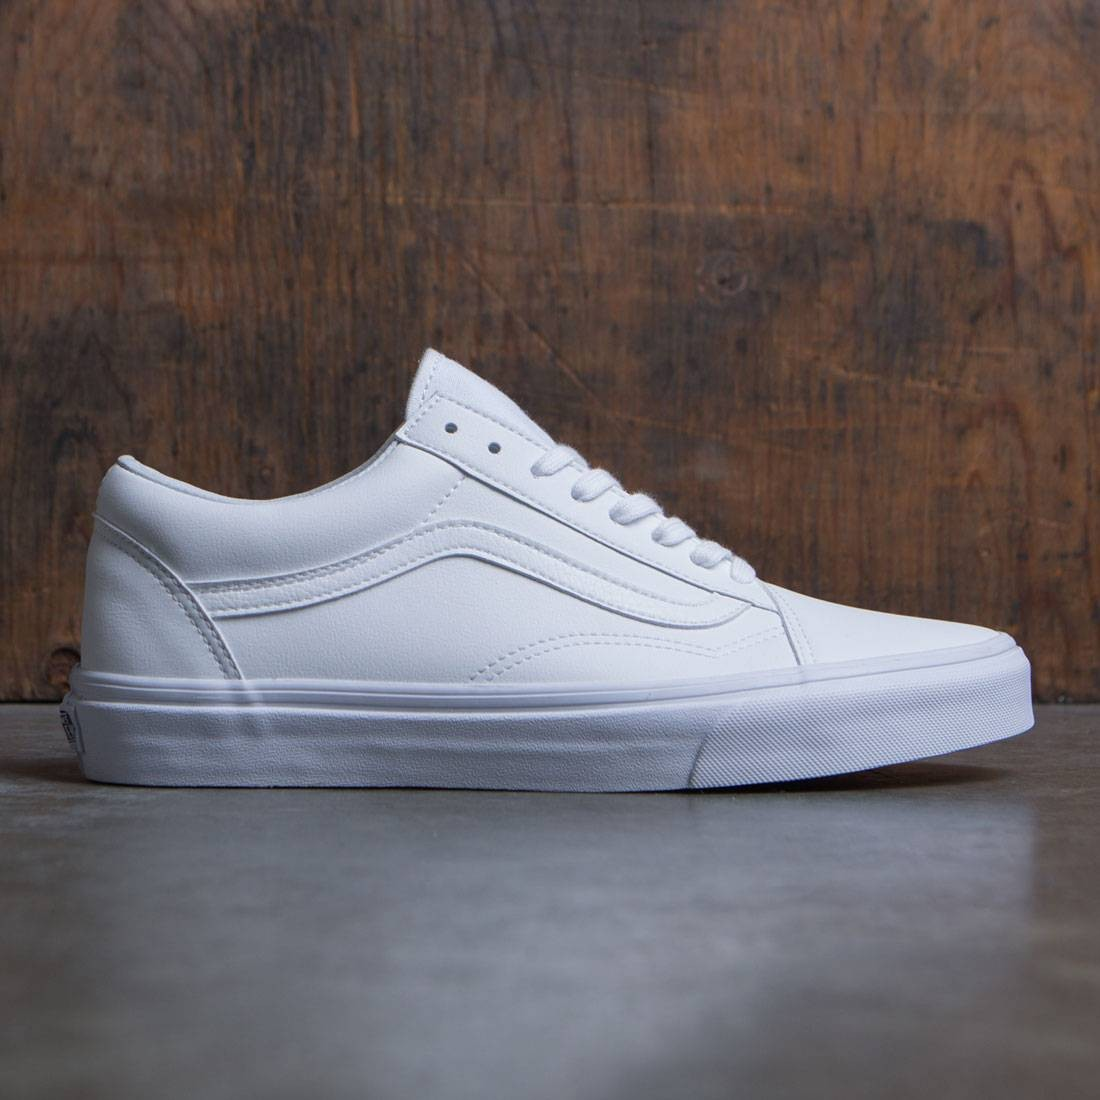 Vans Men Old Skool white classic tumble